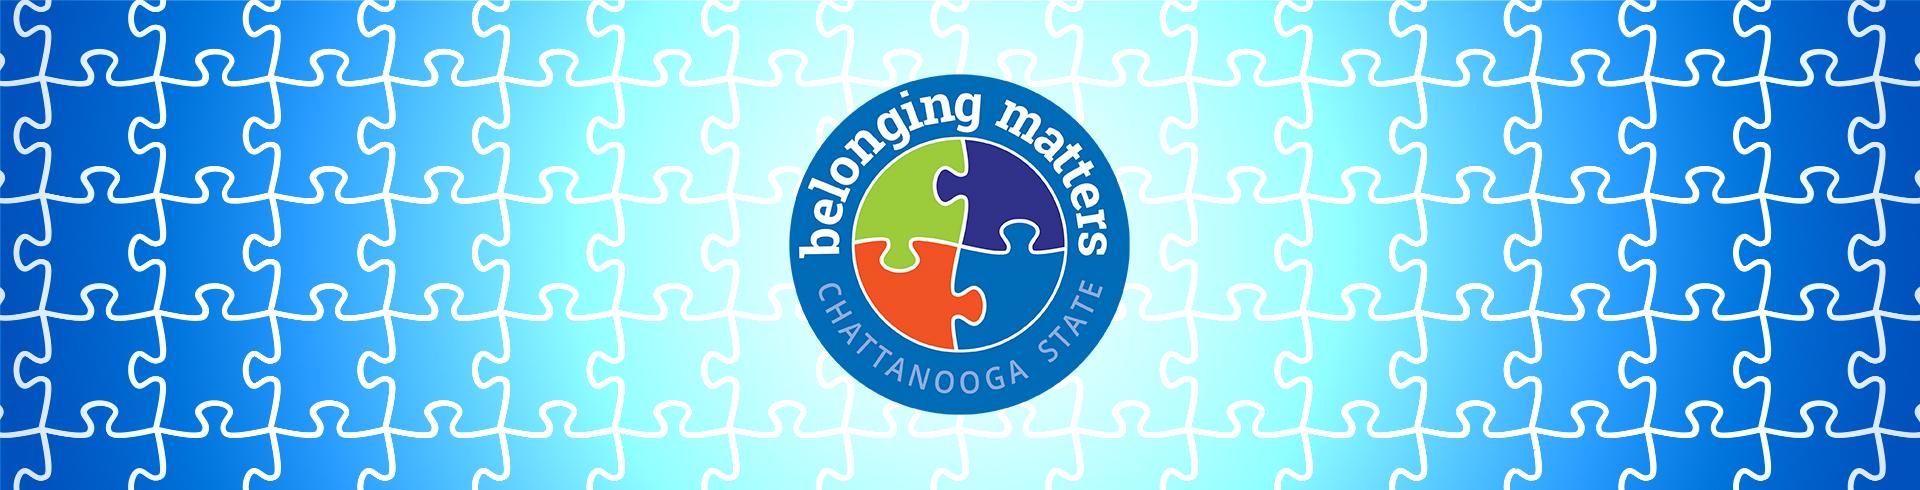 belonging matters banner photo